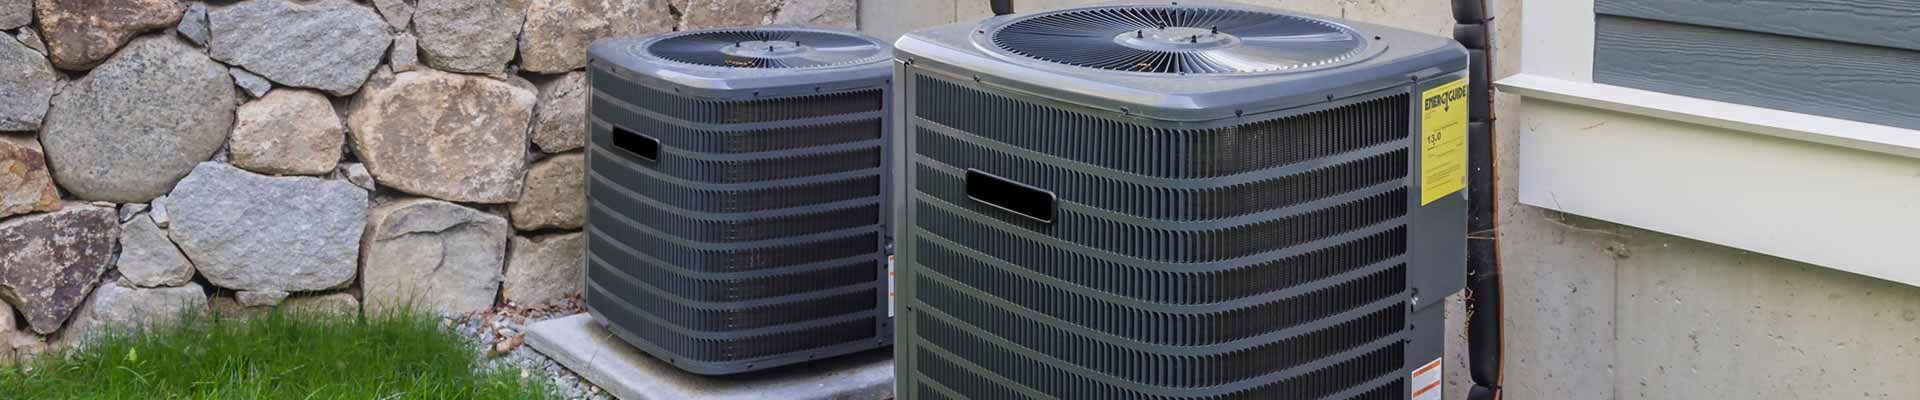 Air Express Heating & Air Conditioning image 12